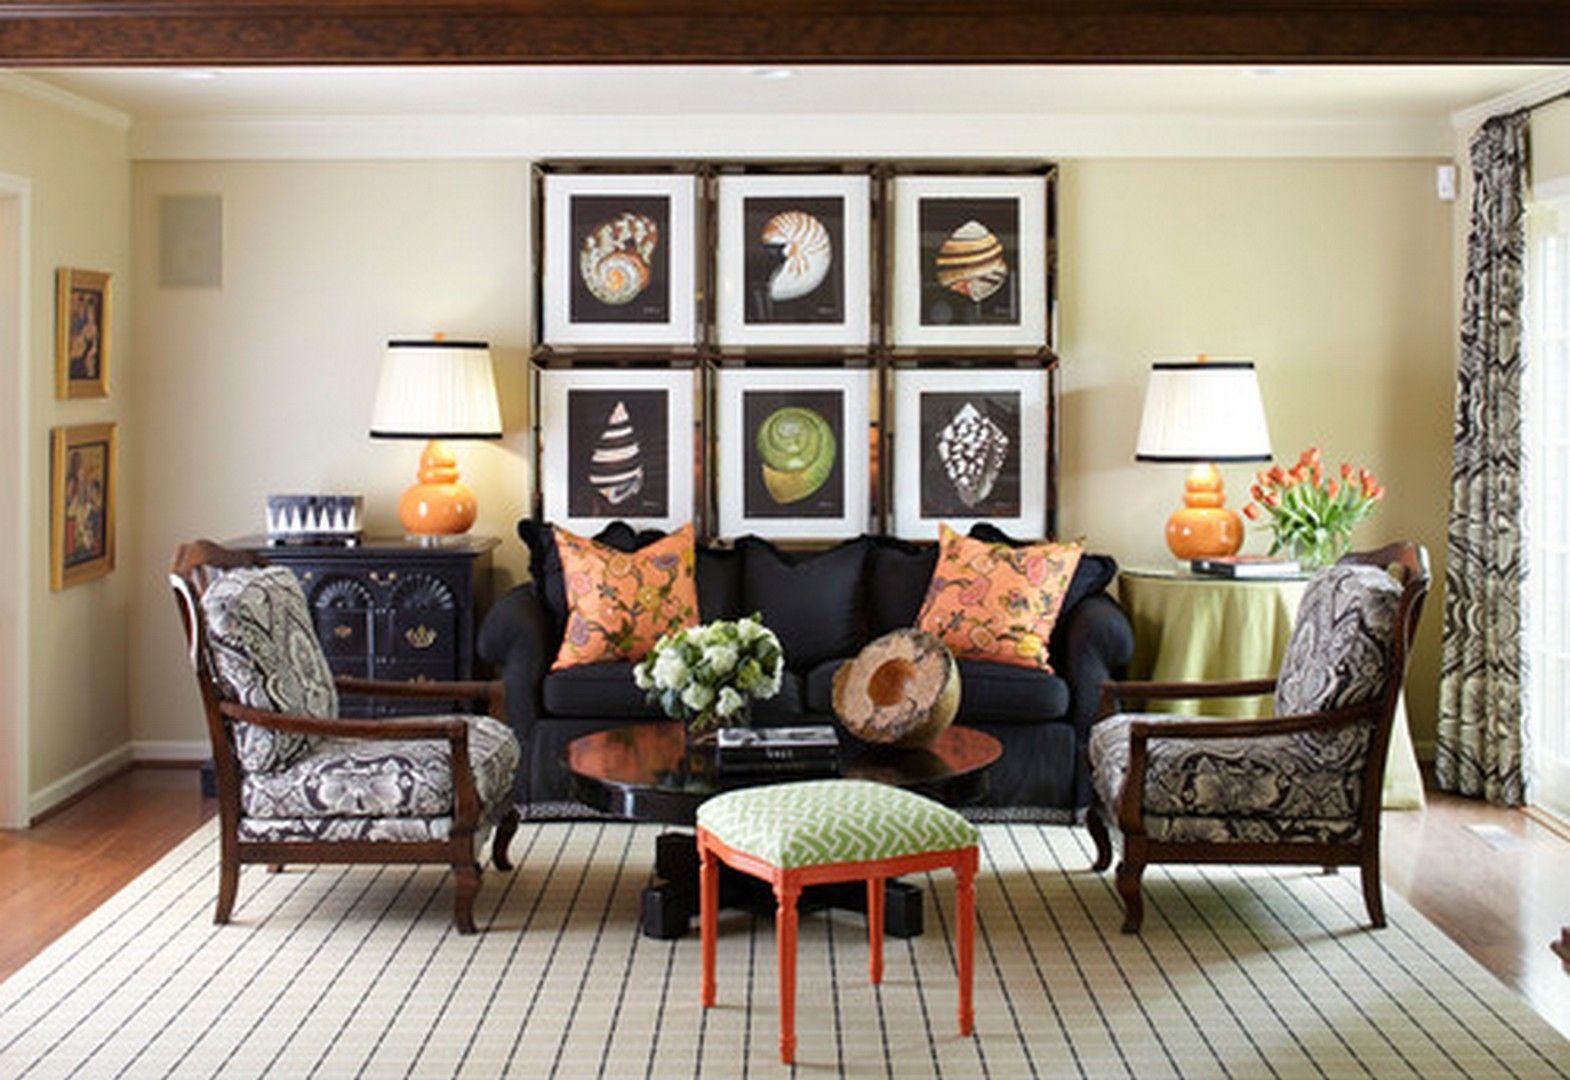 Villa Interior Design A Brilliantly Stunning Home